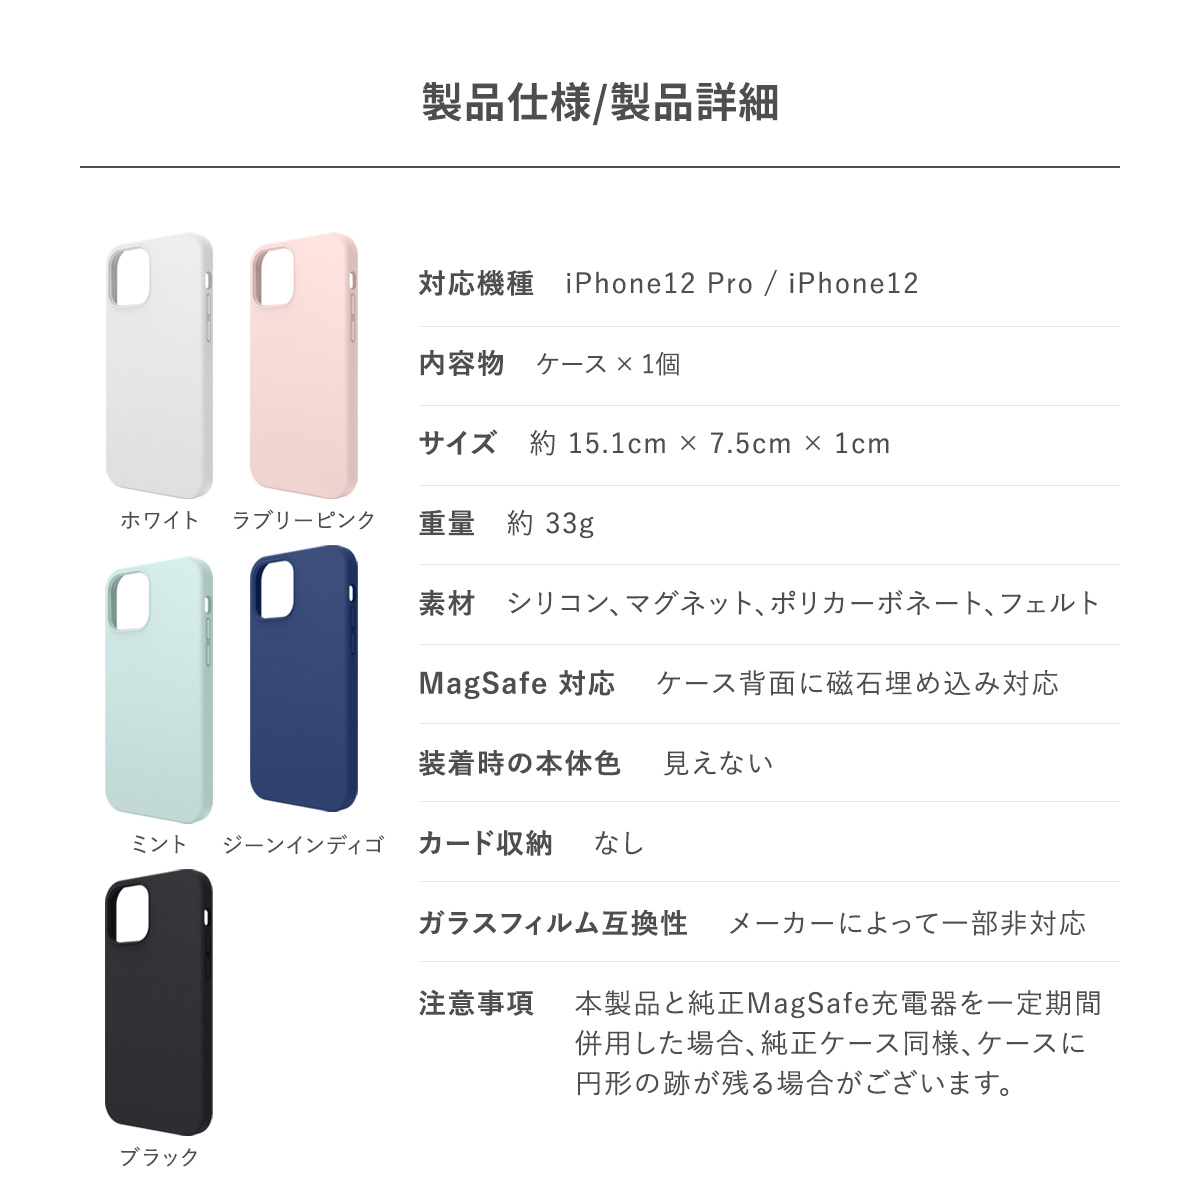 elago MagSafe SOFT SILICONE CASE for iPhone12 Pro / iPhone12